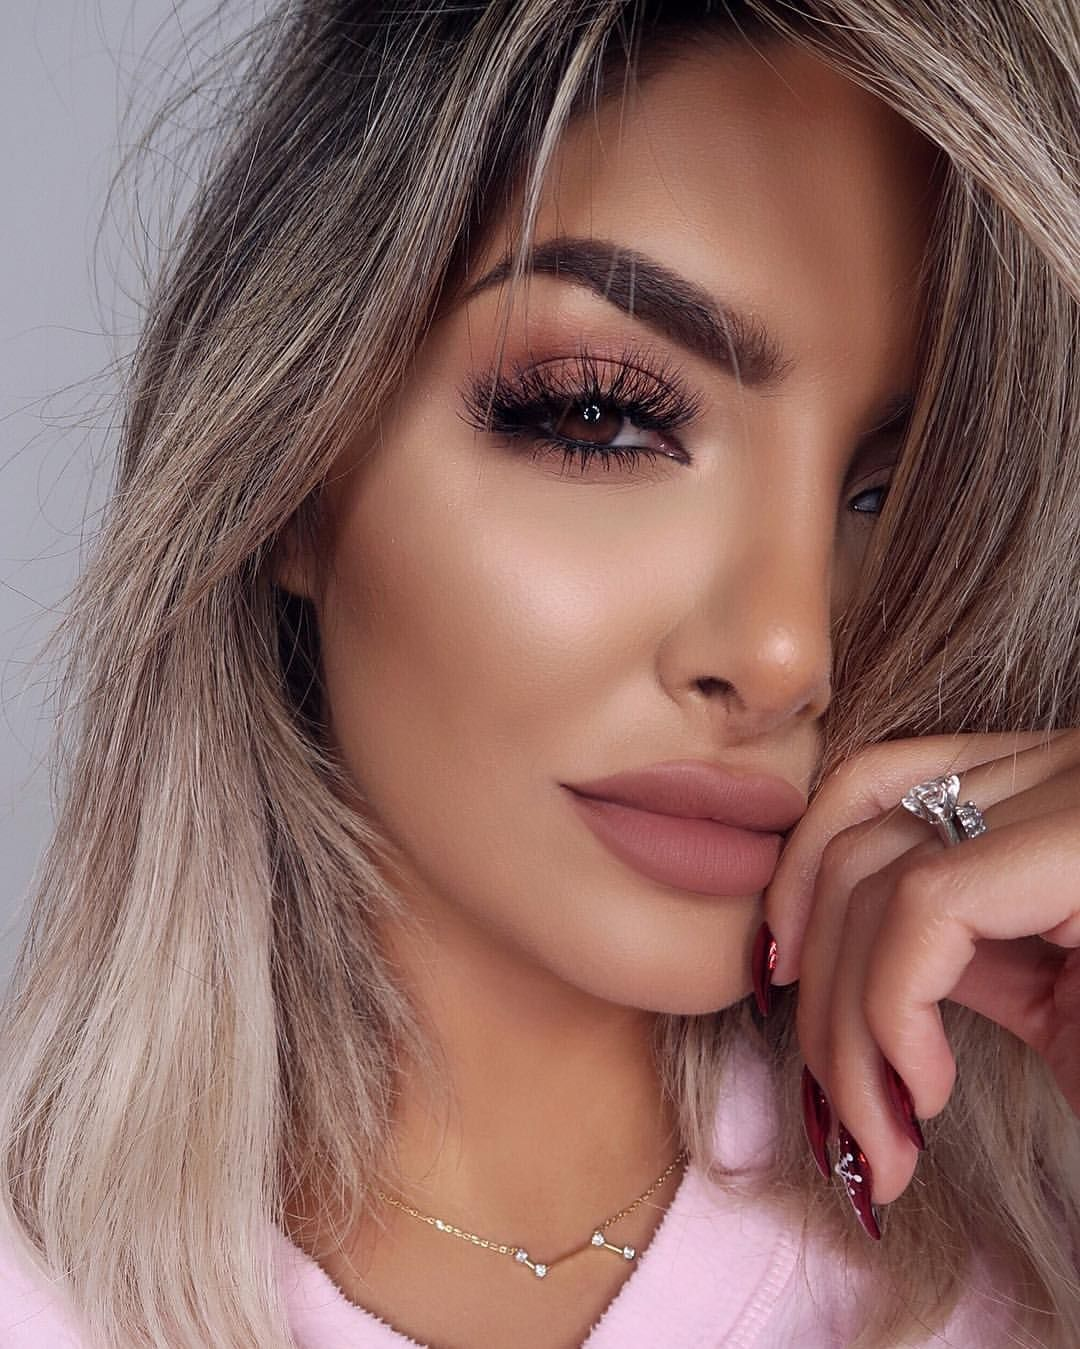 Lipstick- Mac cosmetics #ad #makeup #beauty #lipstick #mac